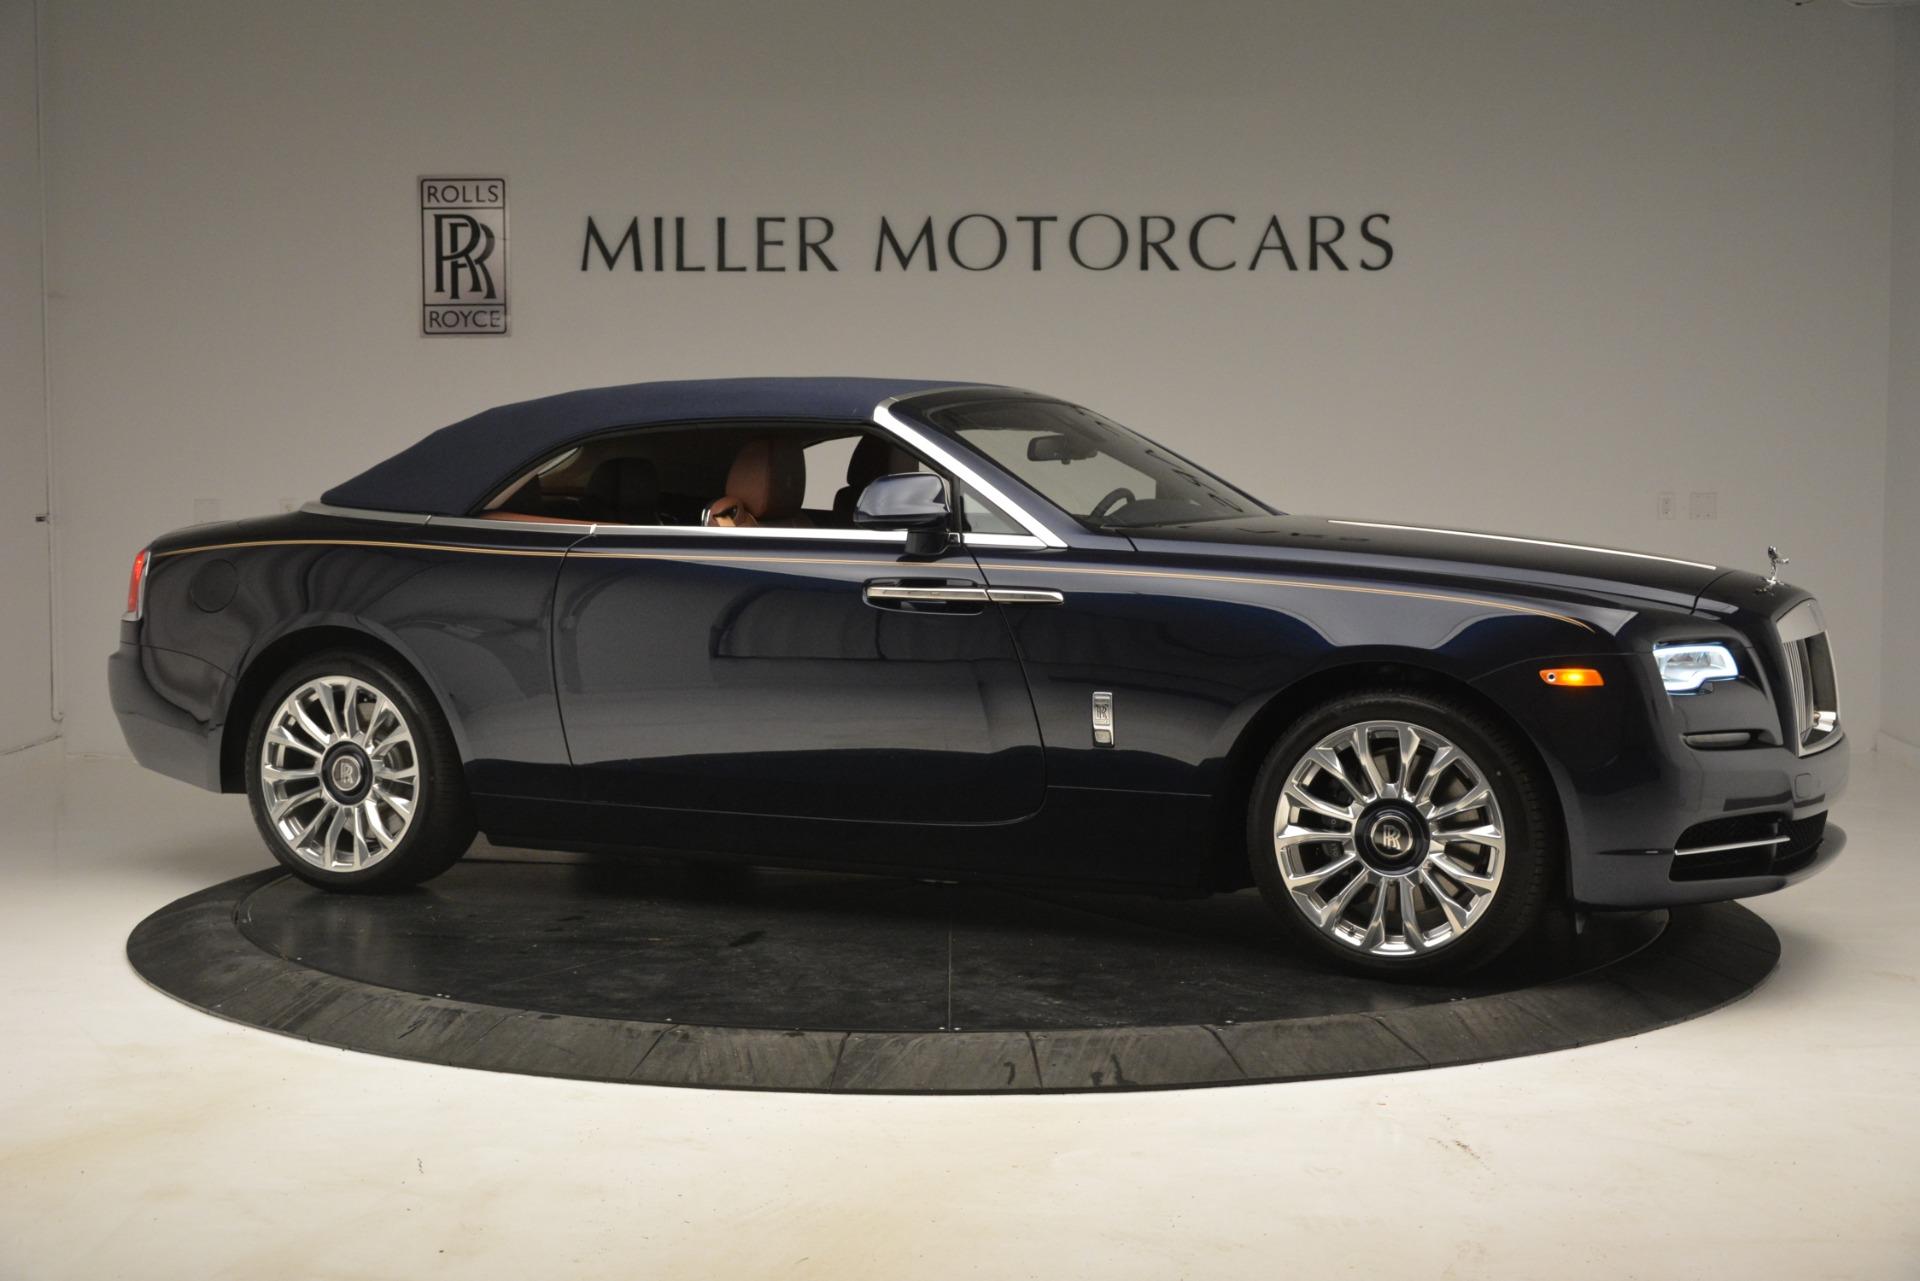 New 2019 Rolls-Royce Dawn  For Sale In Greenwich, CT 2723_p27